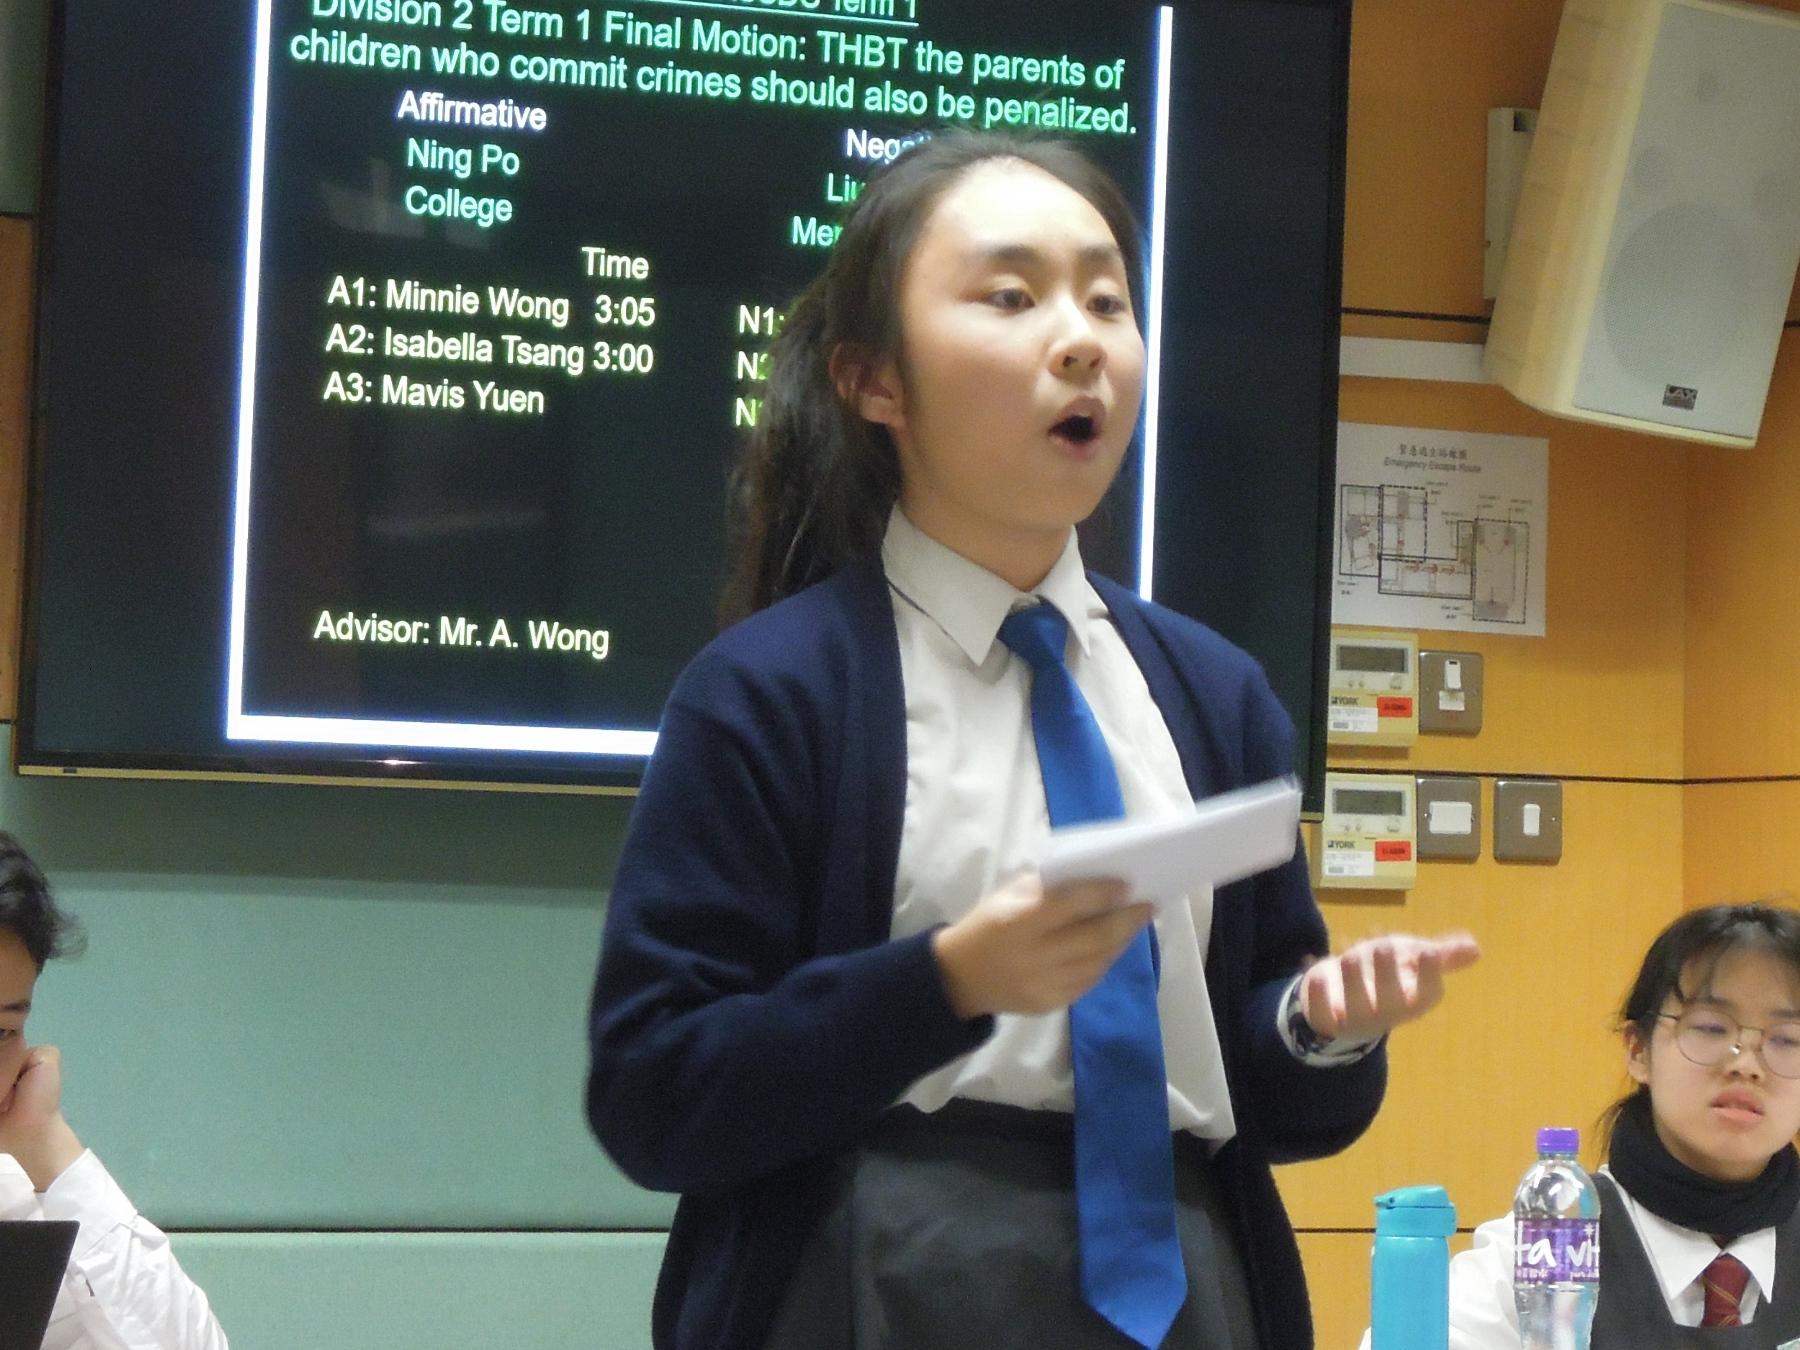 http://npc.edu.hk/sites/default/files/a3_4.jpg